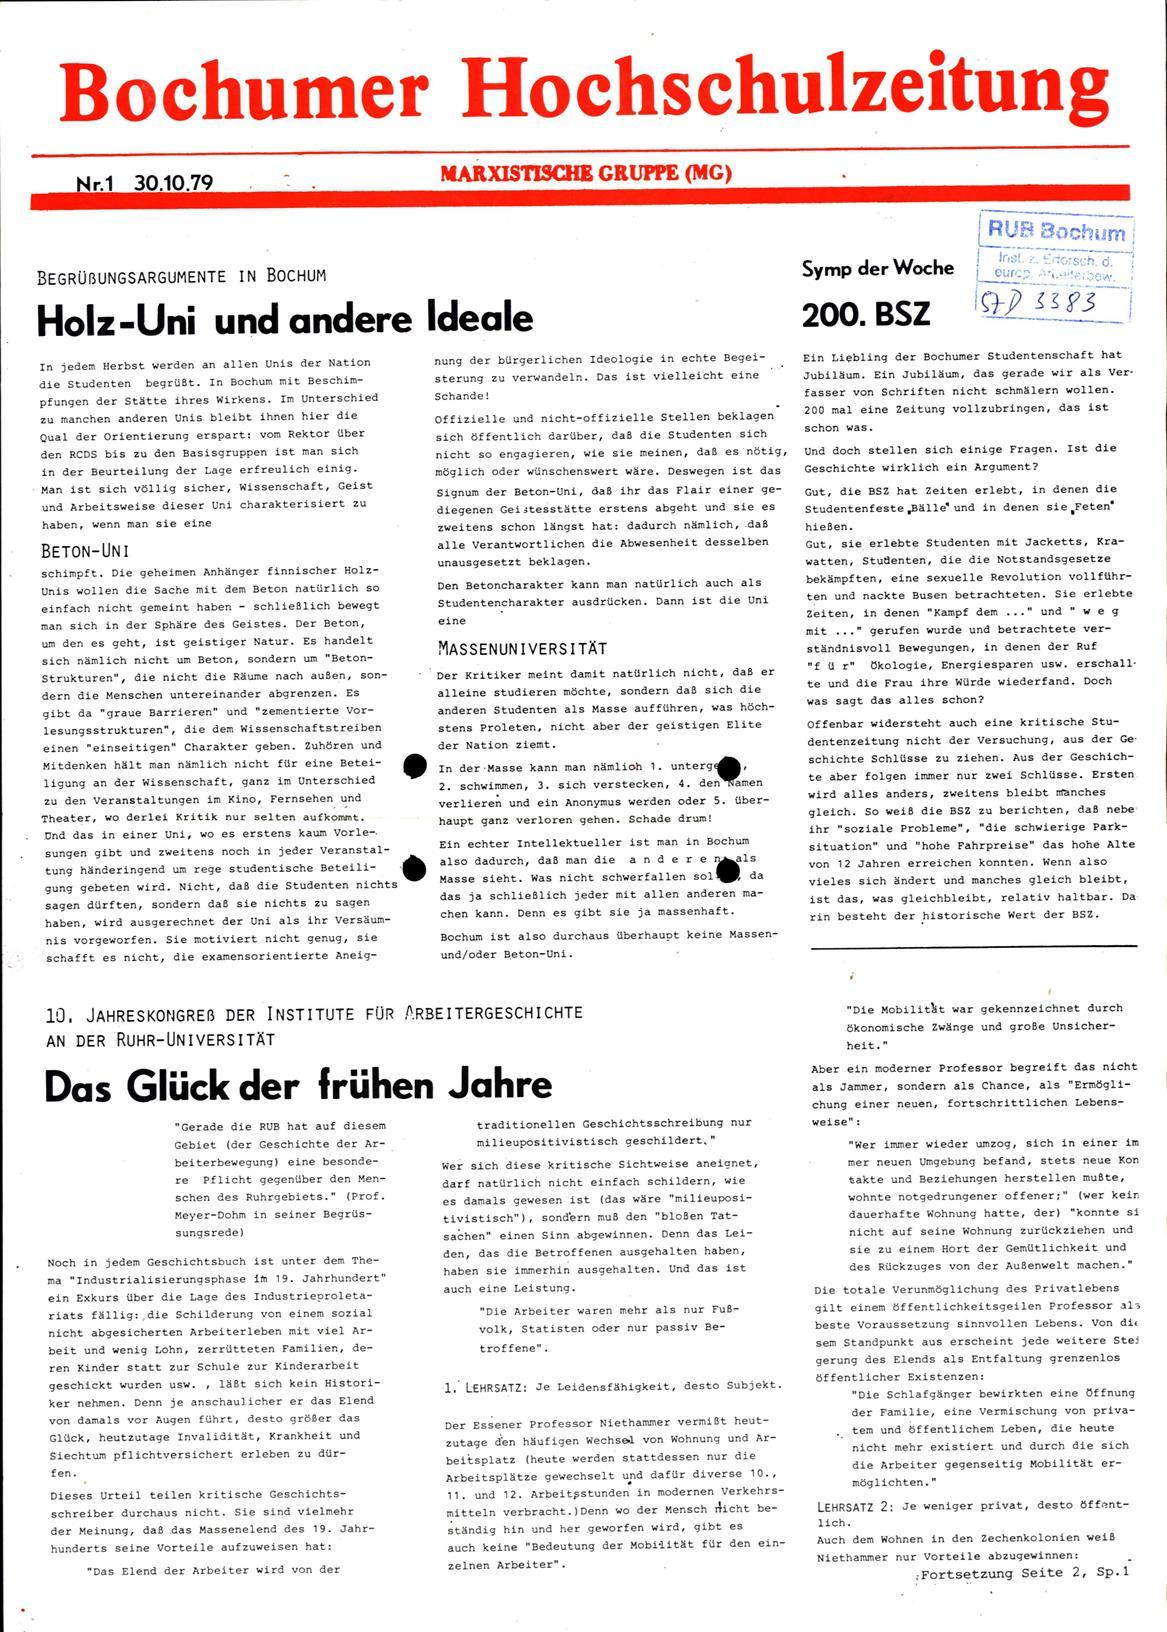 Bochum_BHZ_19791030_001_001